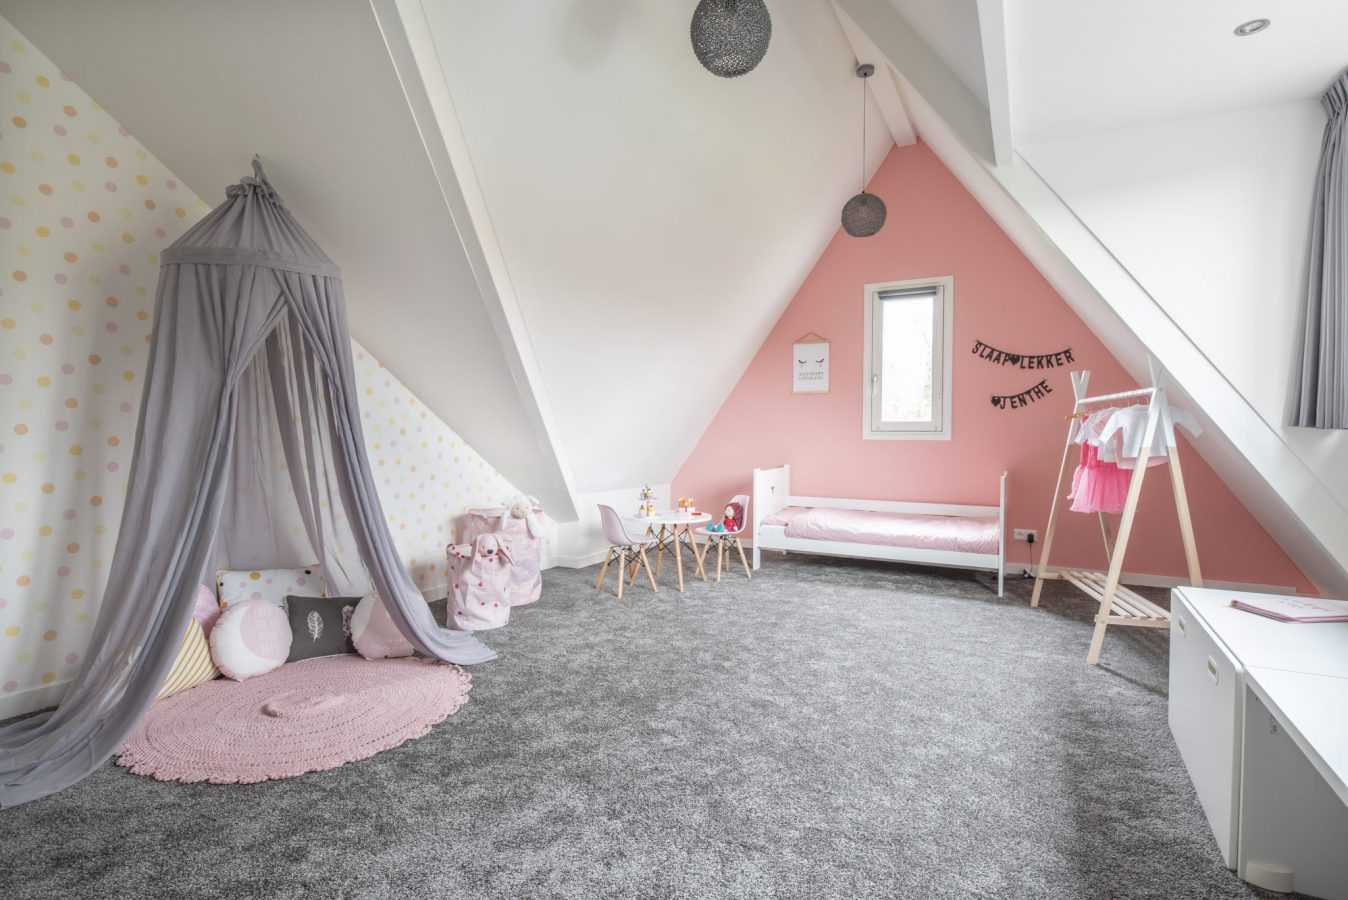 bed 2 meisjeskamer interieuradvies interieurontwerp styling binnenhuisarchitect Hedel Den Bosch